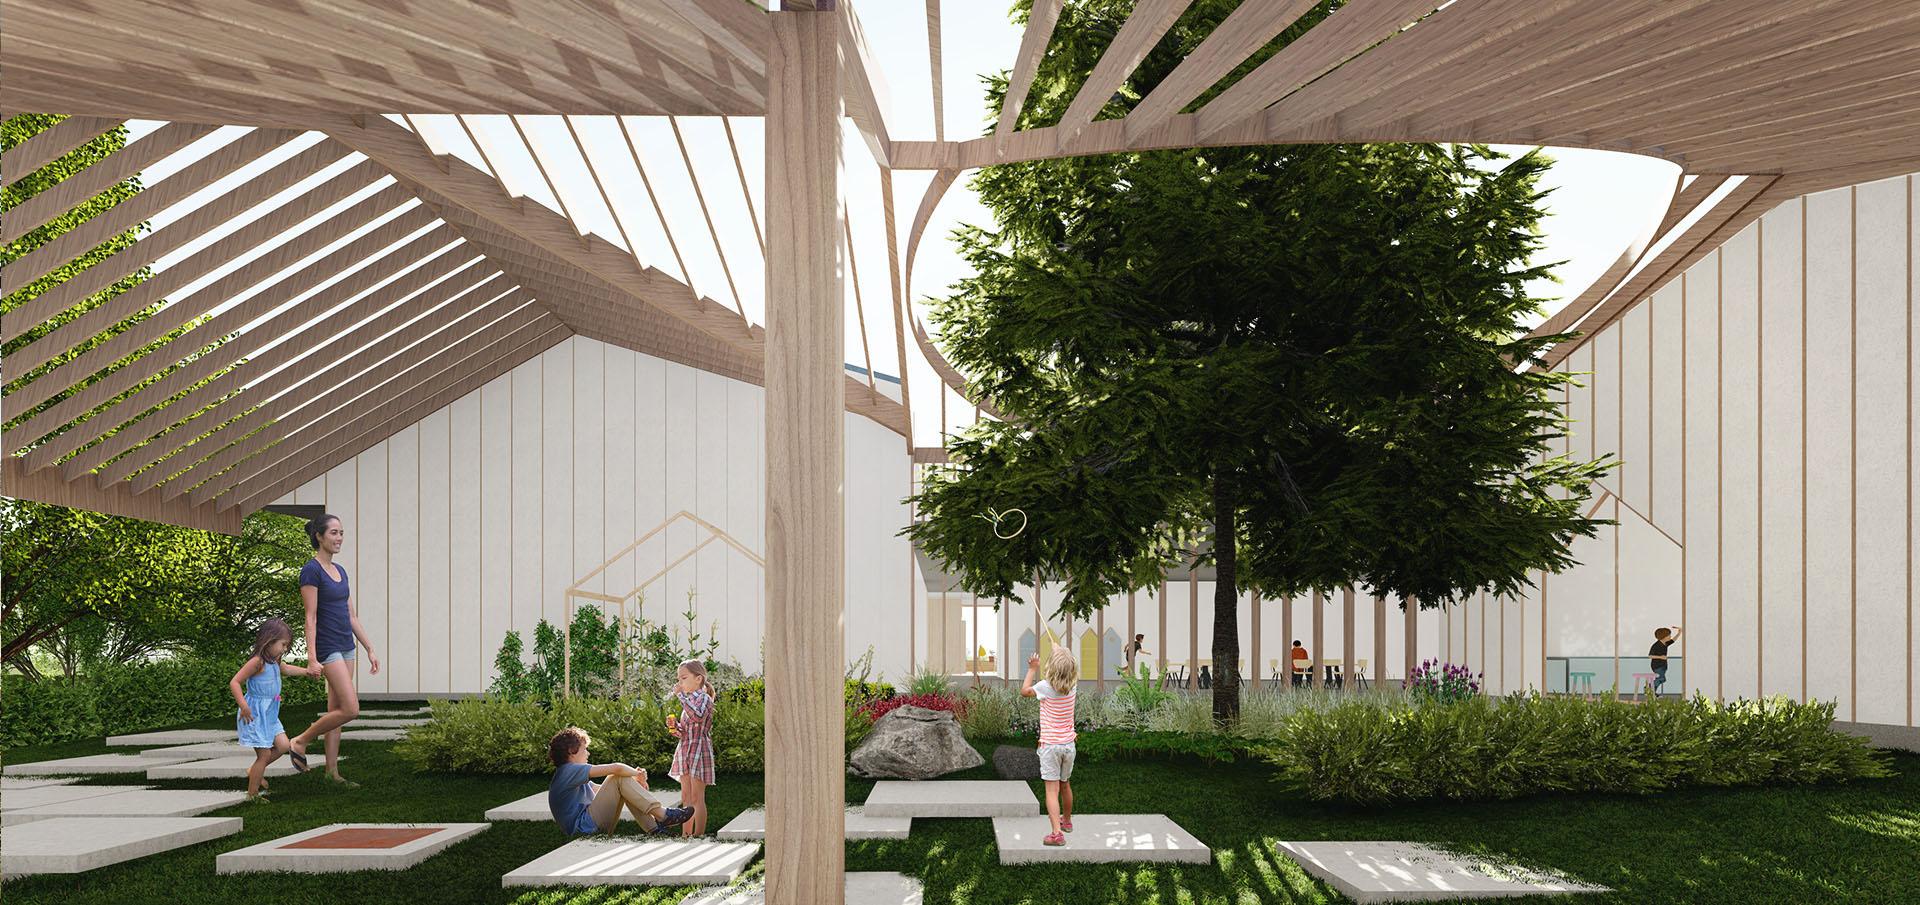 sastudio architecture kindergarden school prague tiago sá